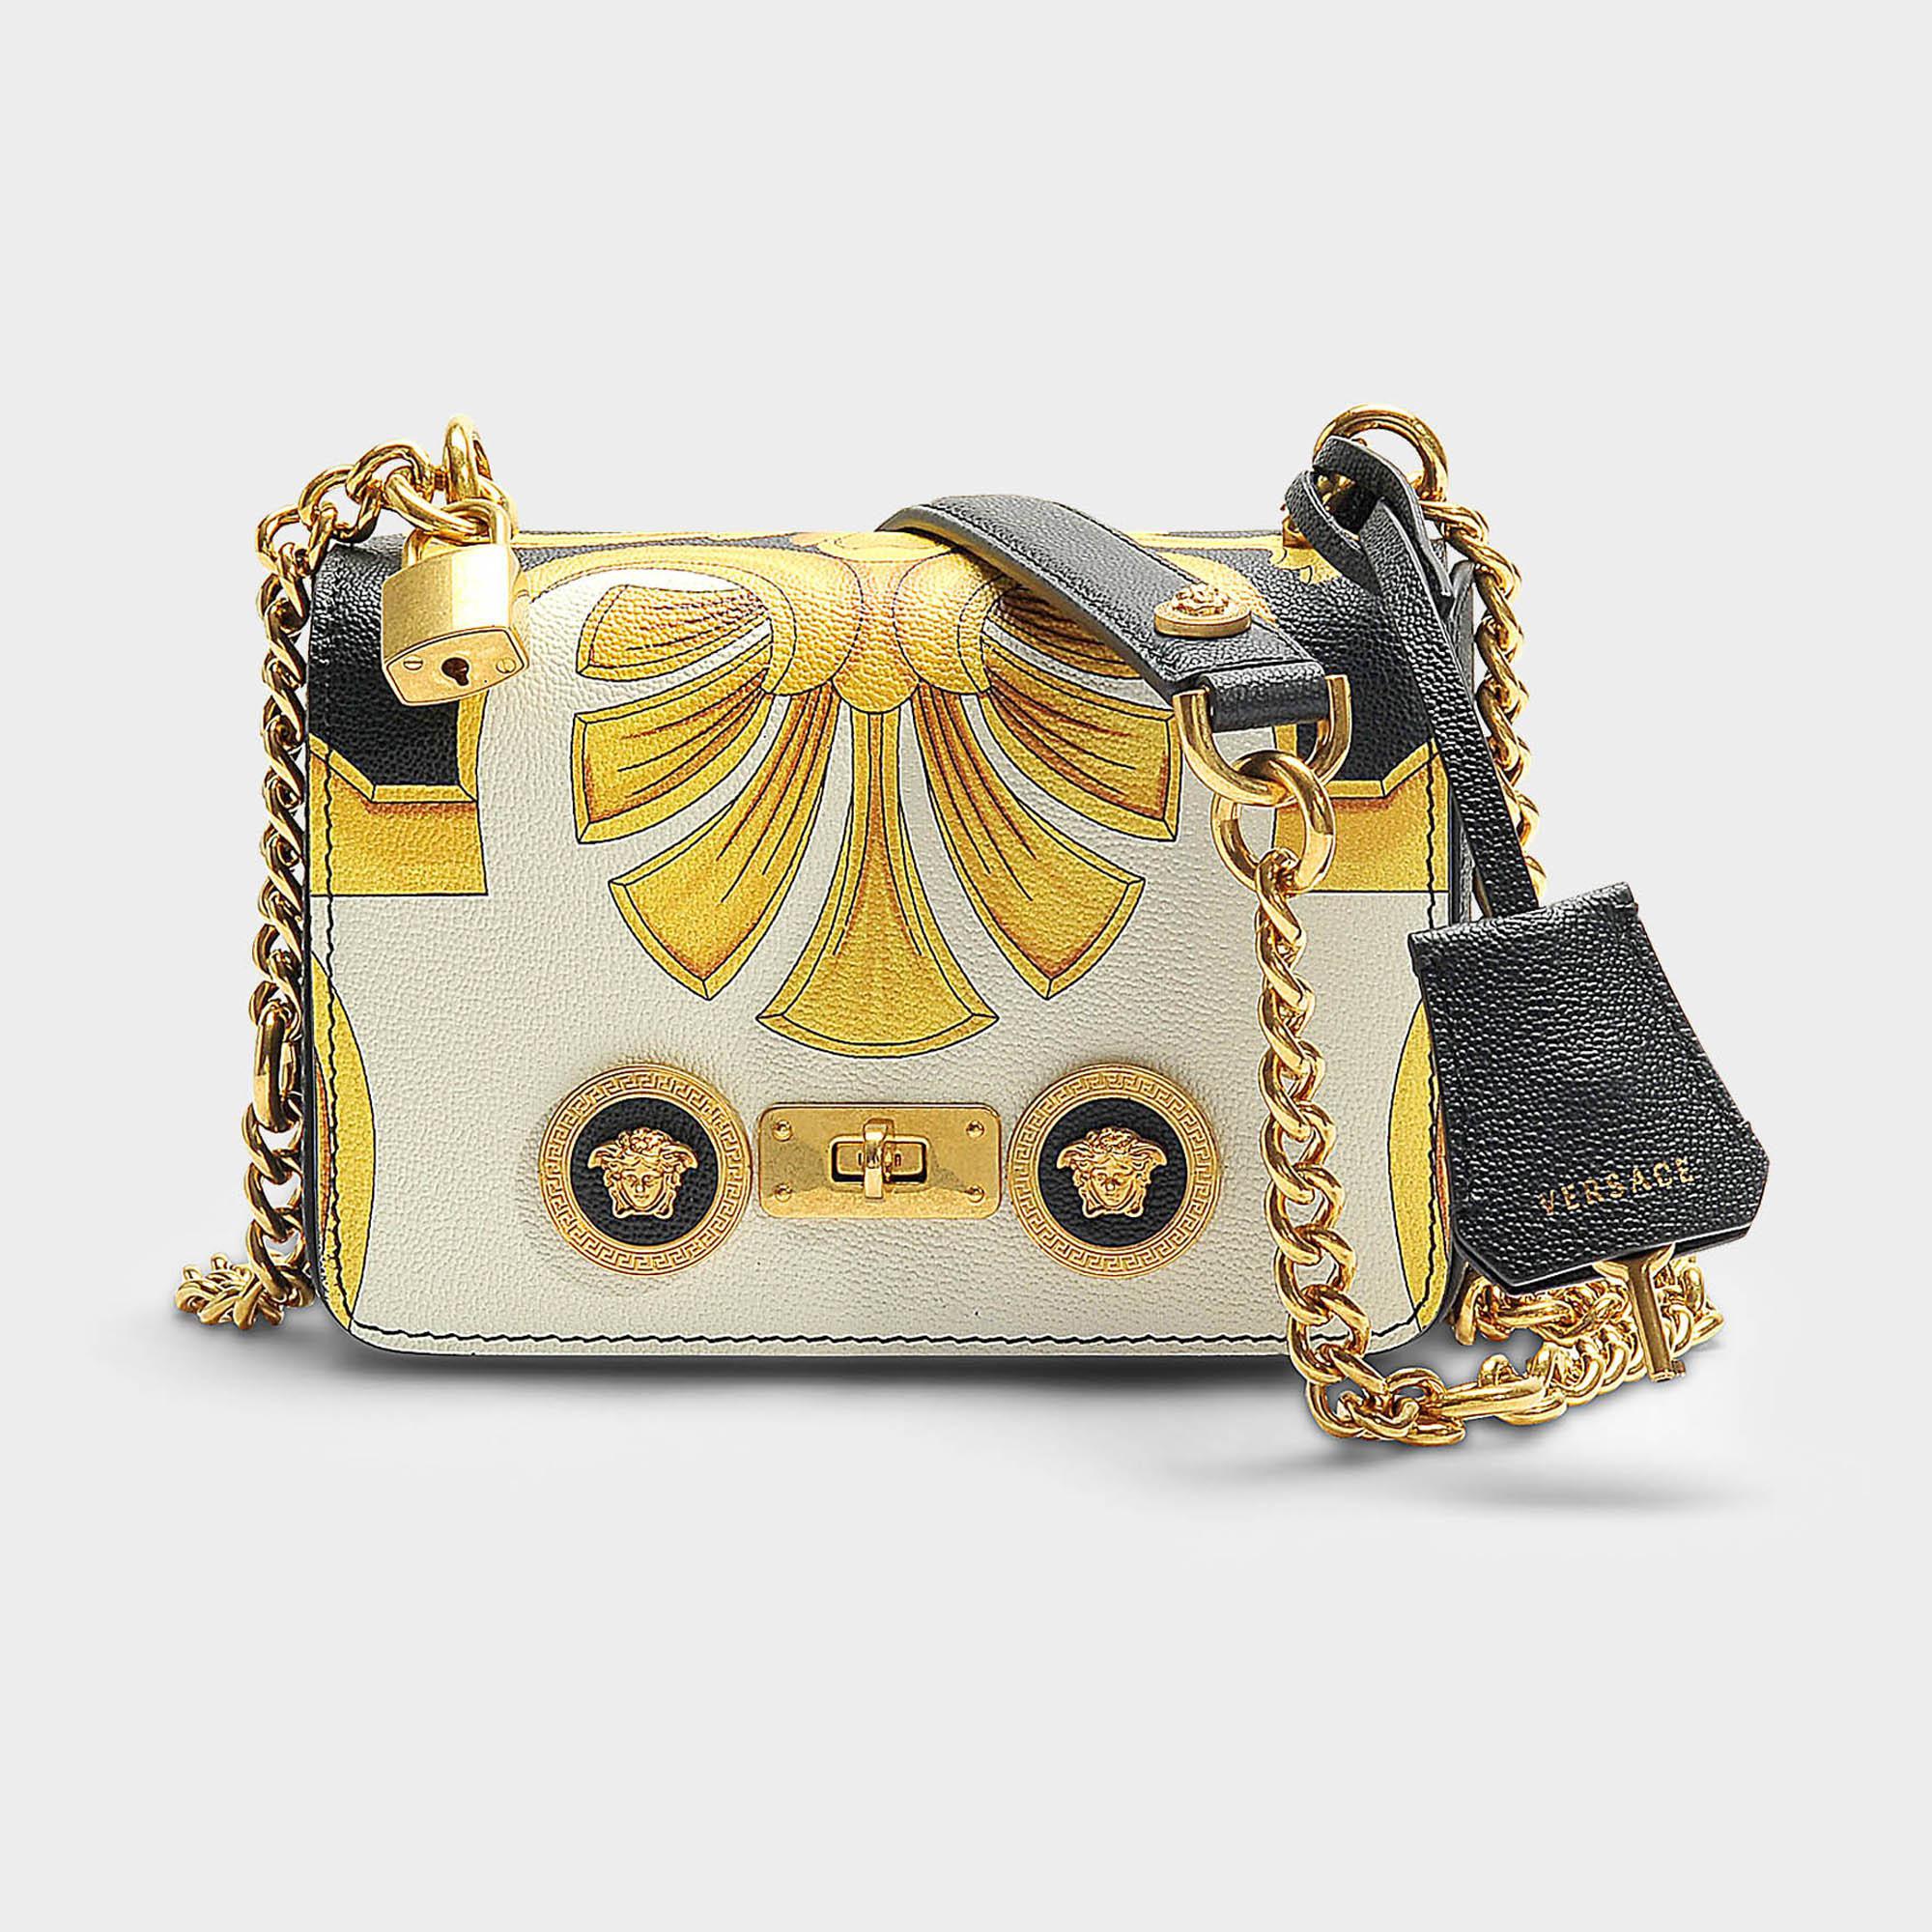 701f4dff536a Versace. Women s Small Barocco Shoulder Bag In Black Barroco Printed  Calfskin